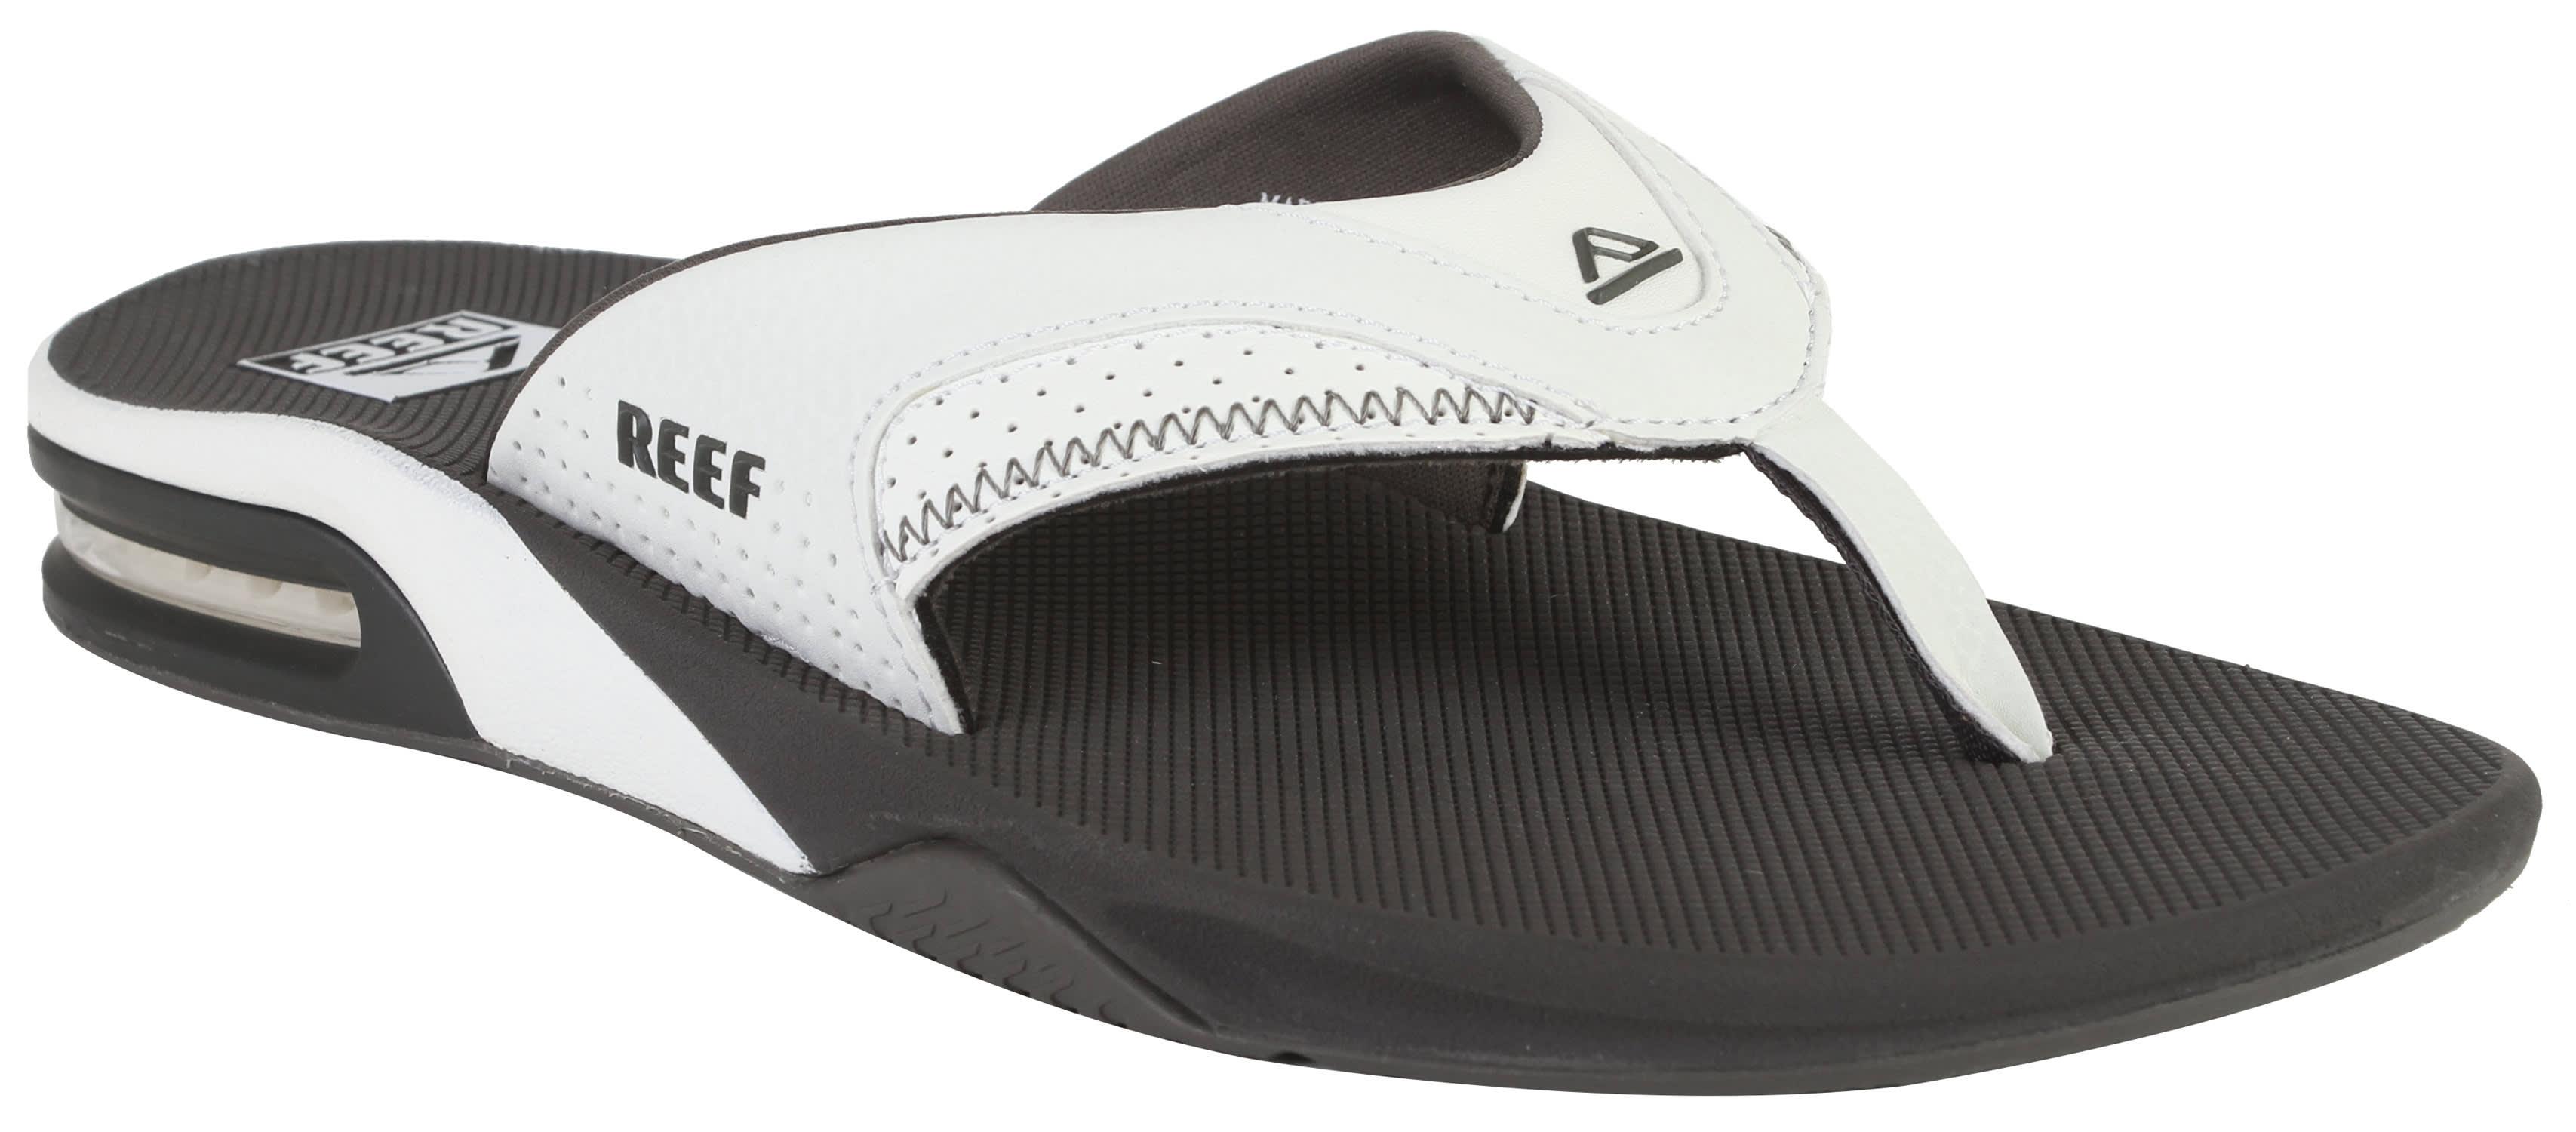 4c957775fec Reef Fanning Sandals - thumbnail 2